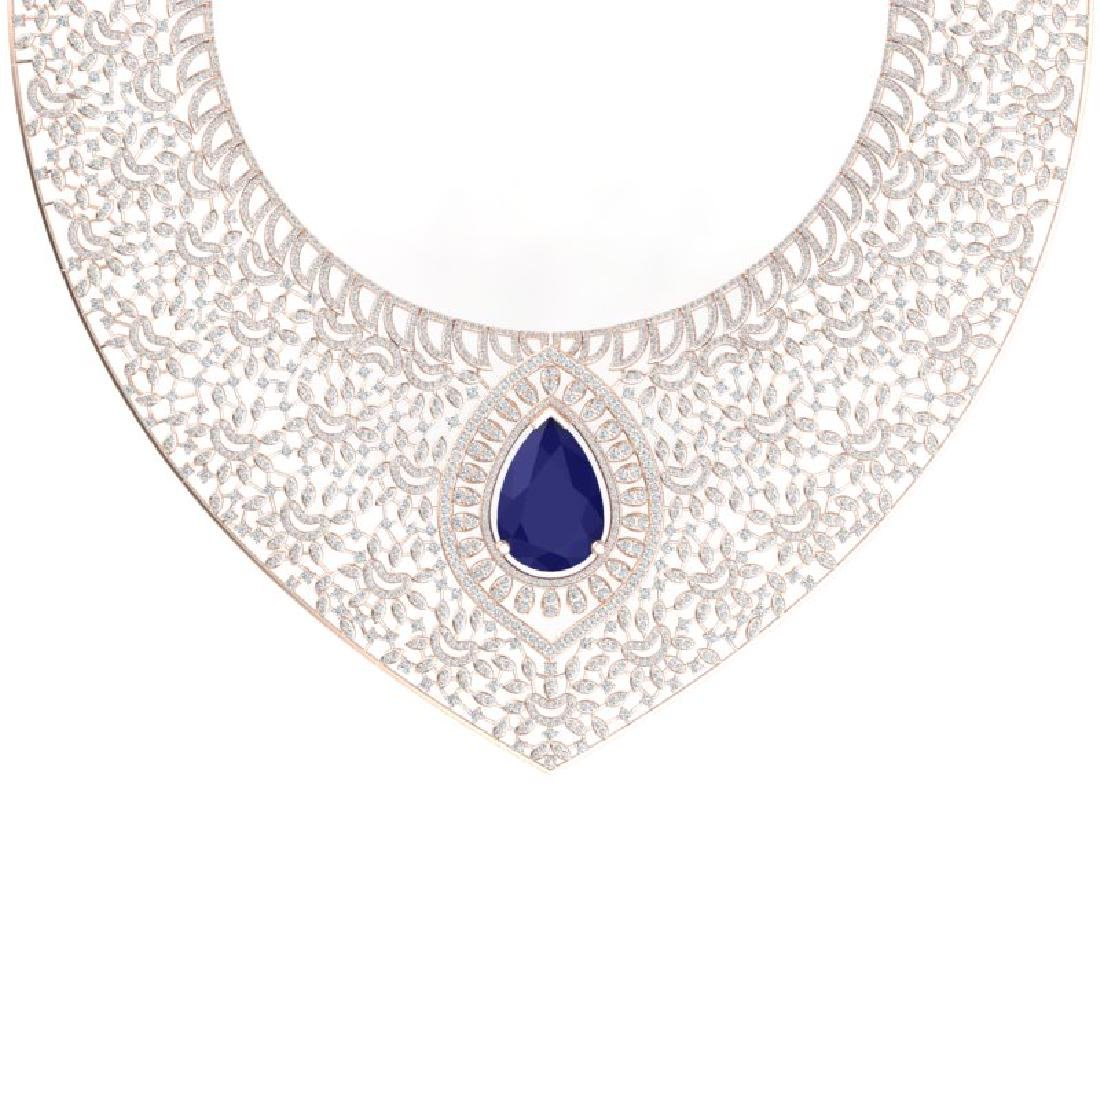 63.93 CTW Royalty Sapphire & VS Diamond Necklace 18K - 2